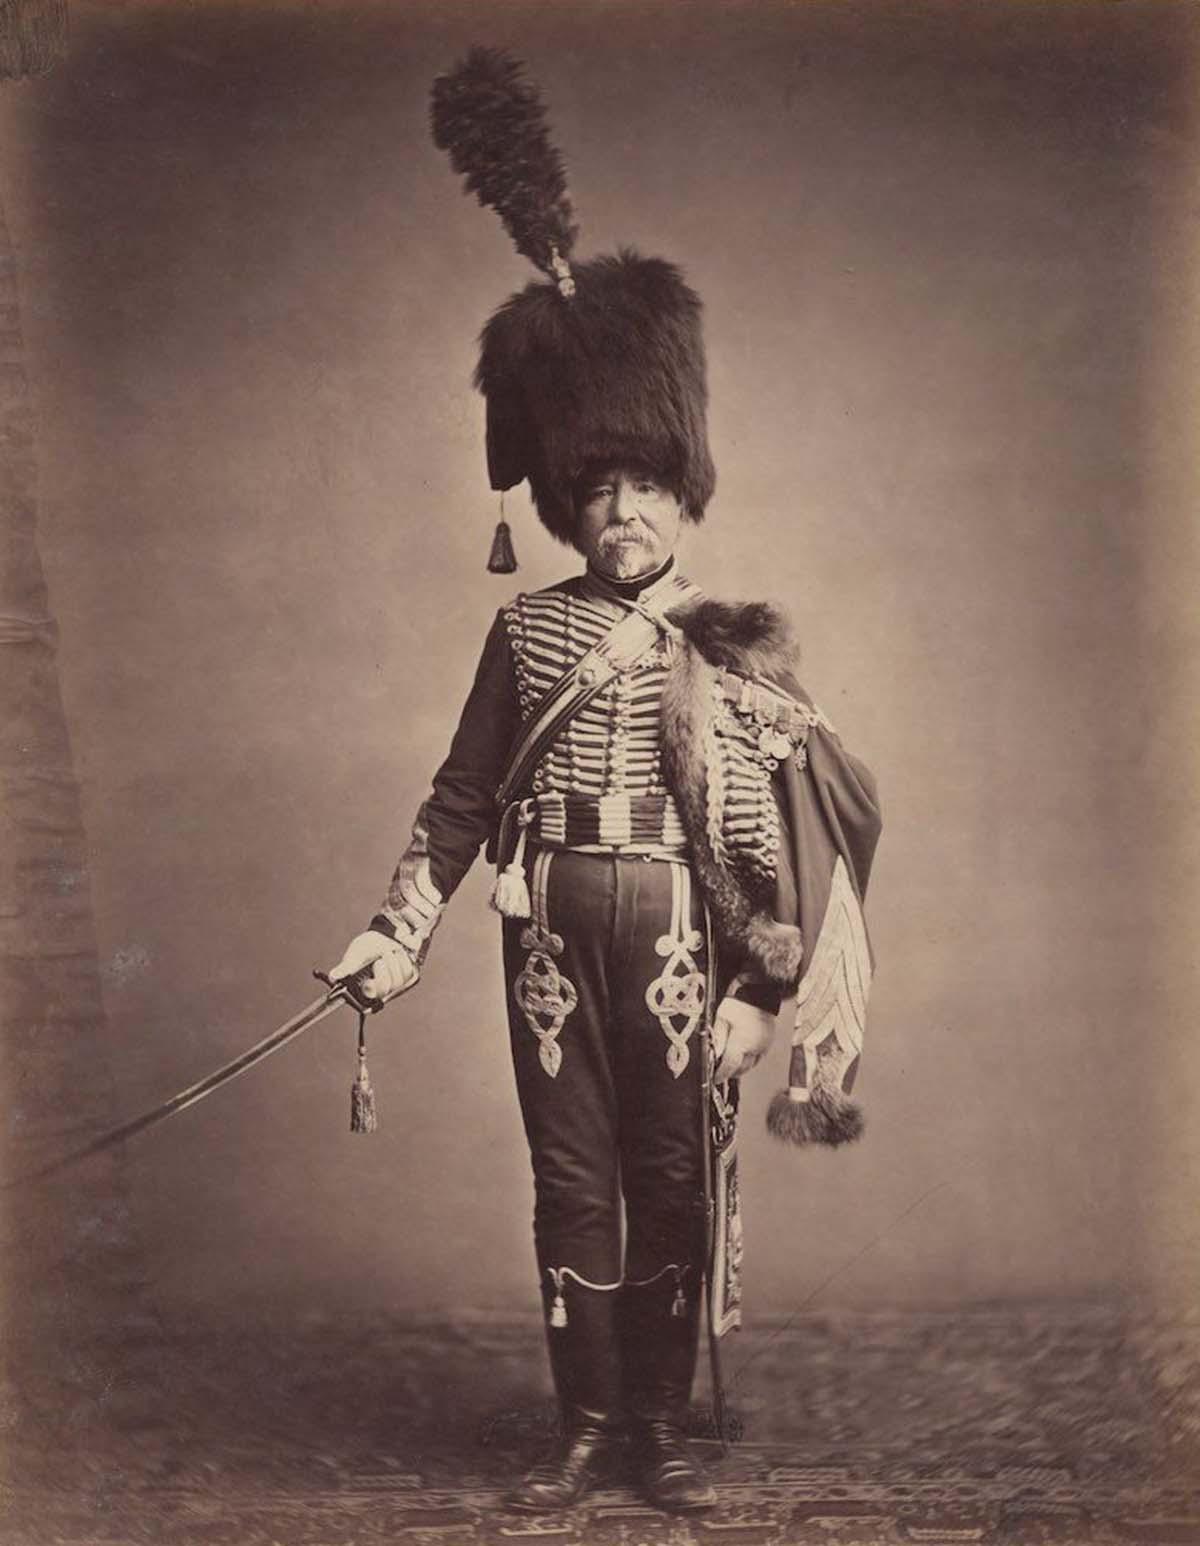 Quartermaster Fabry of the 1st Hussars.